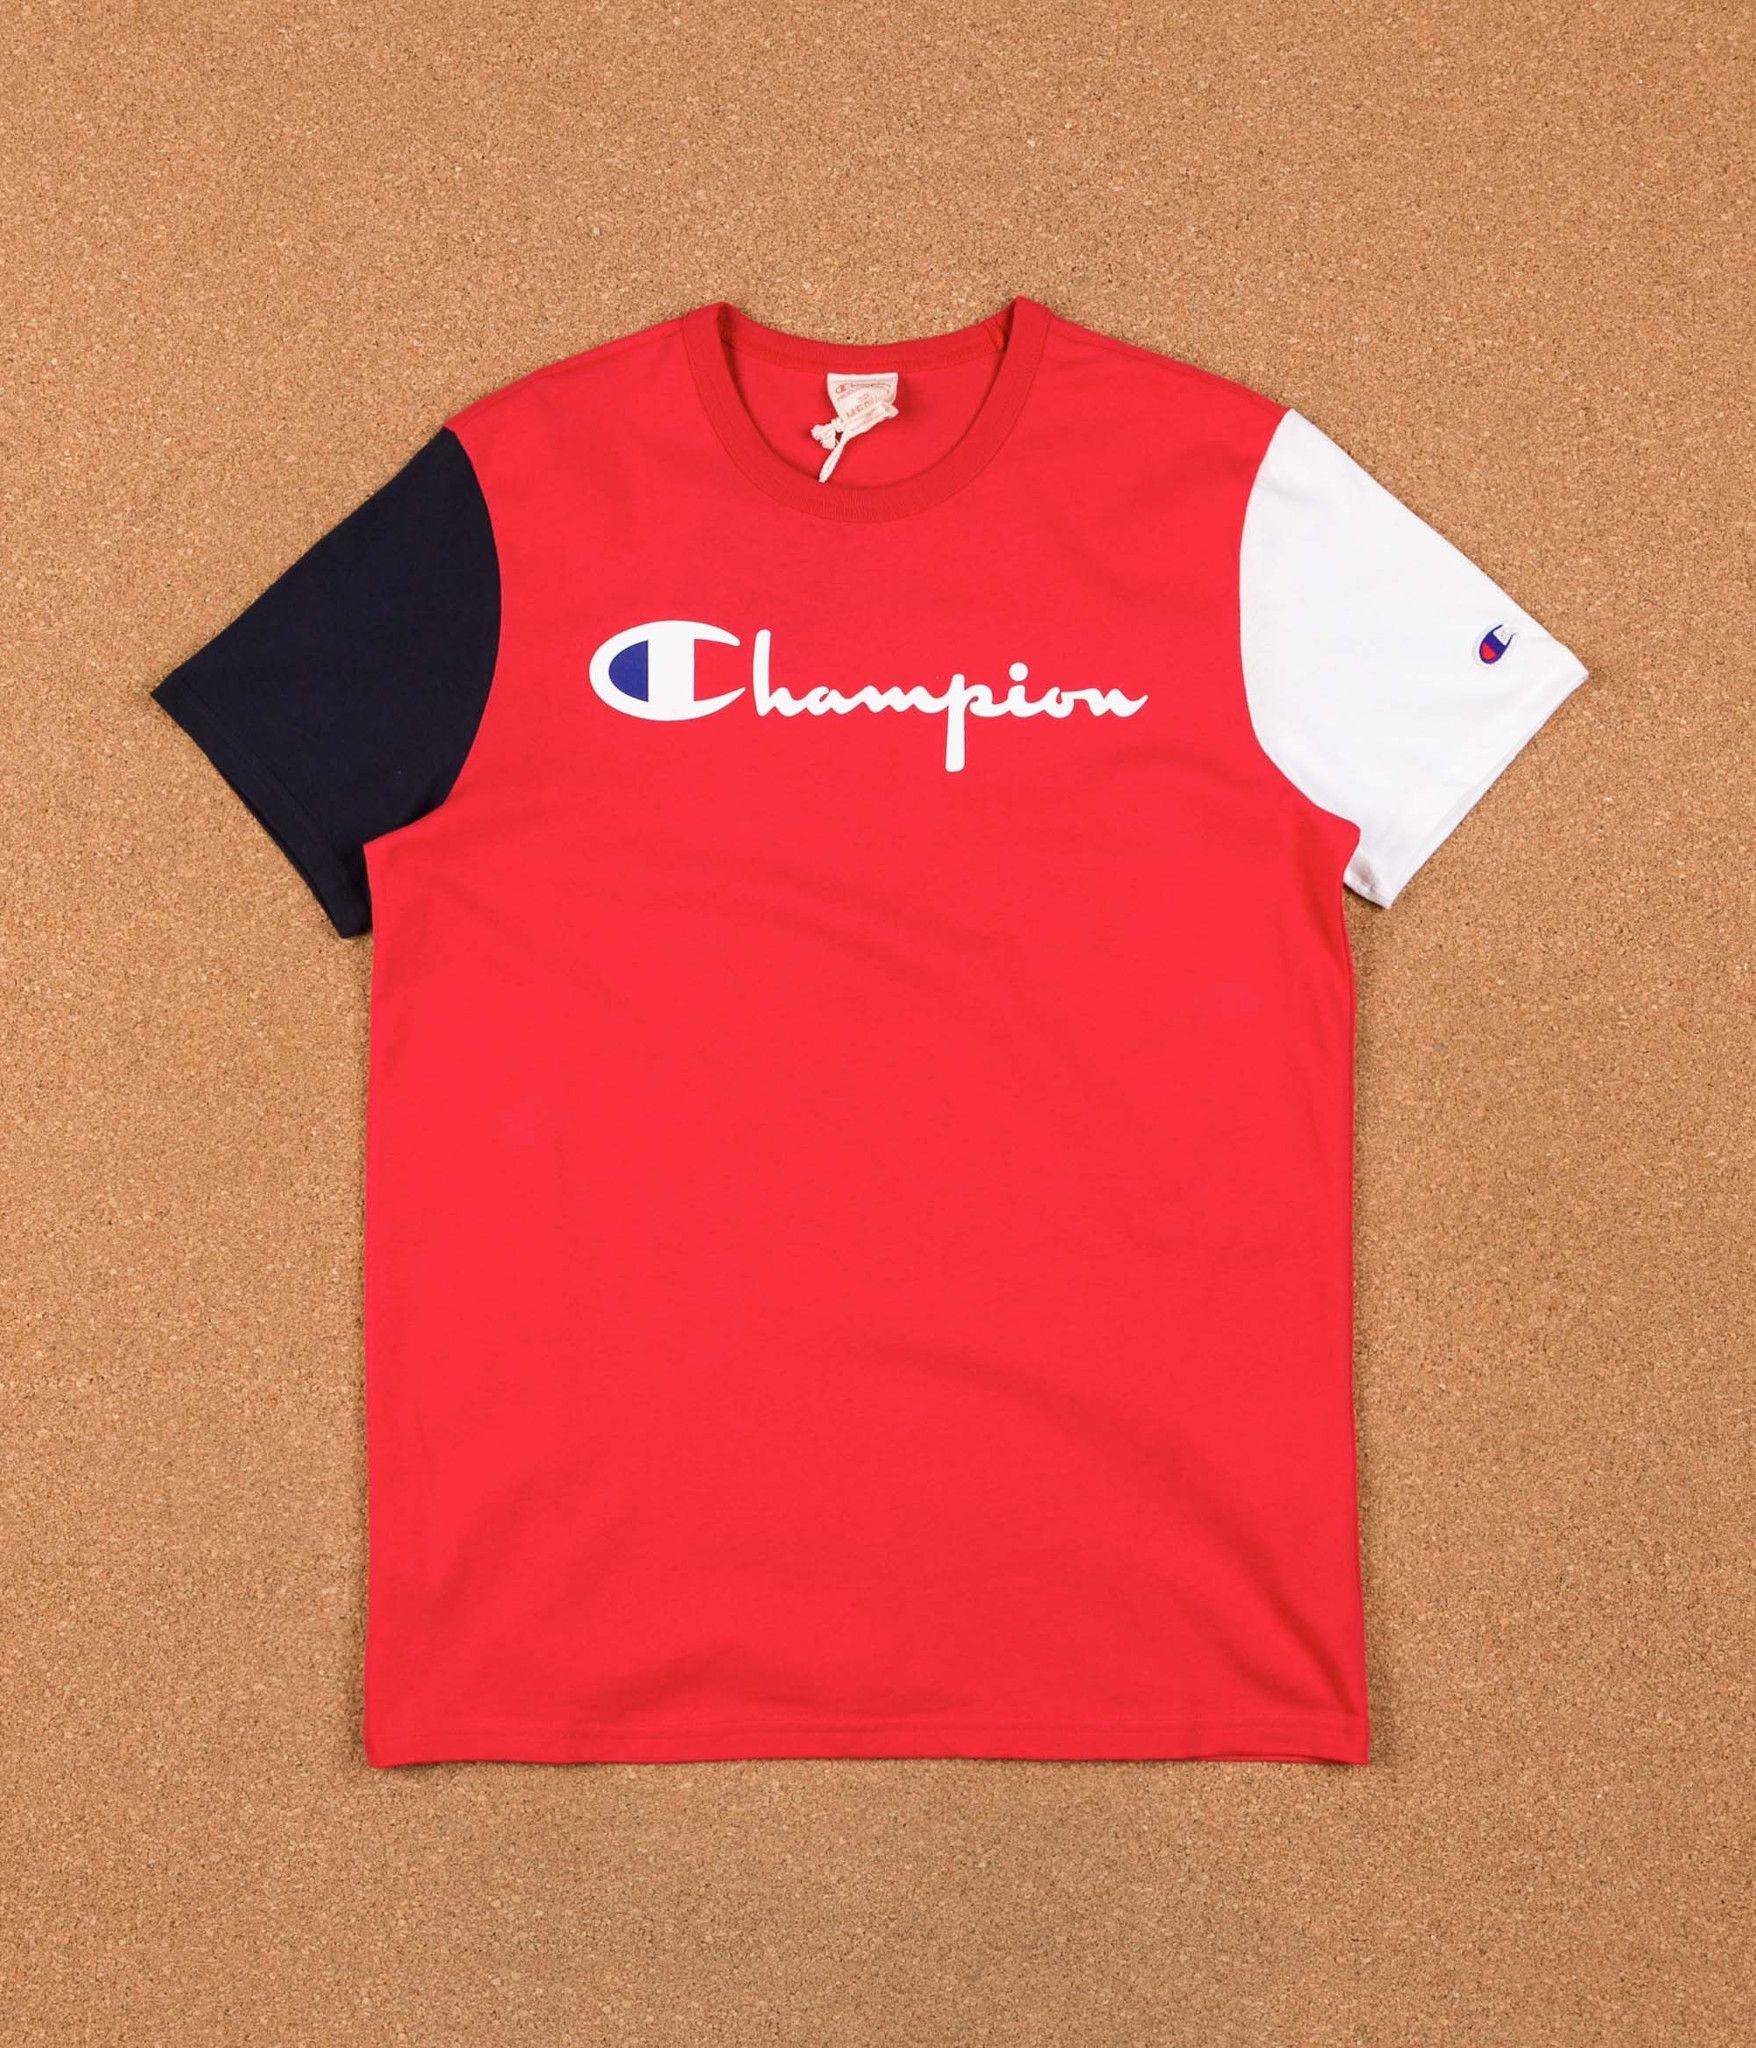 e413f7a8 Champion Reverse Weave Tricolour Script Logo T-Shirt - Red / Navy / White